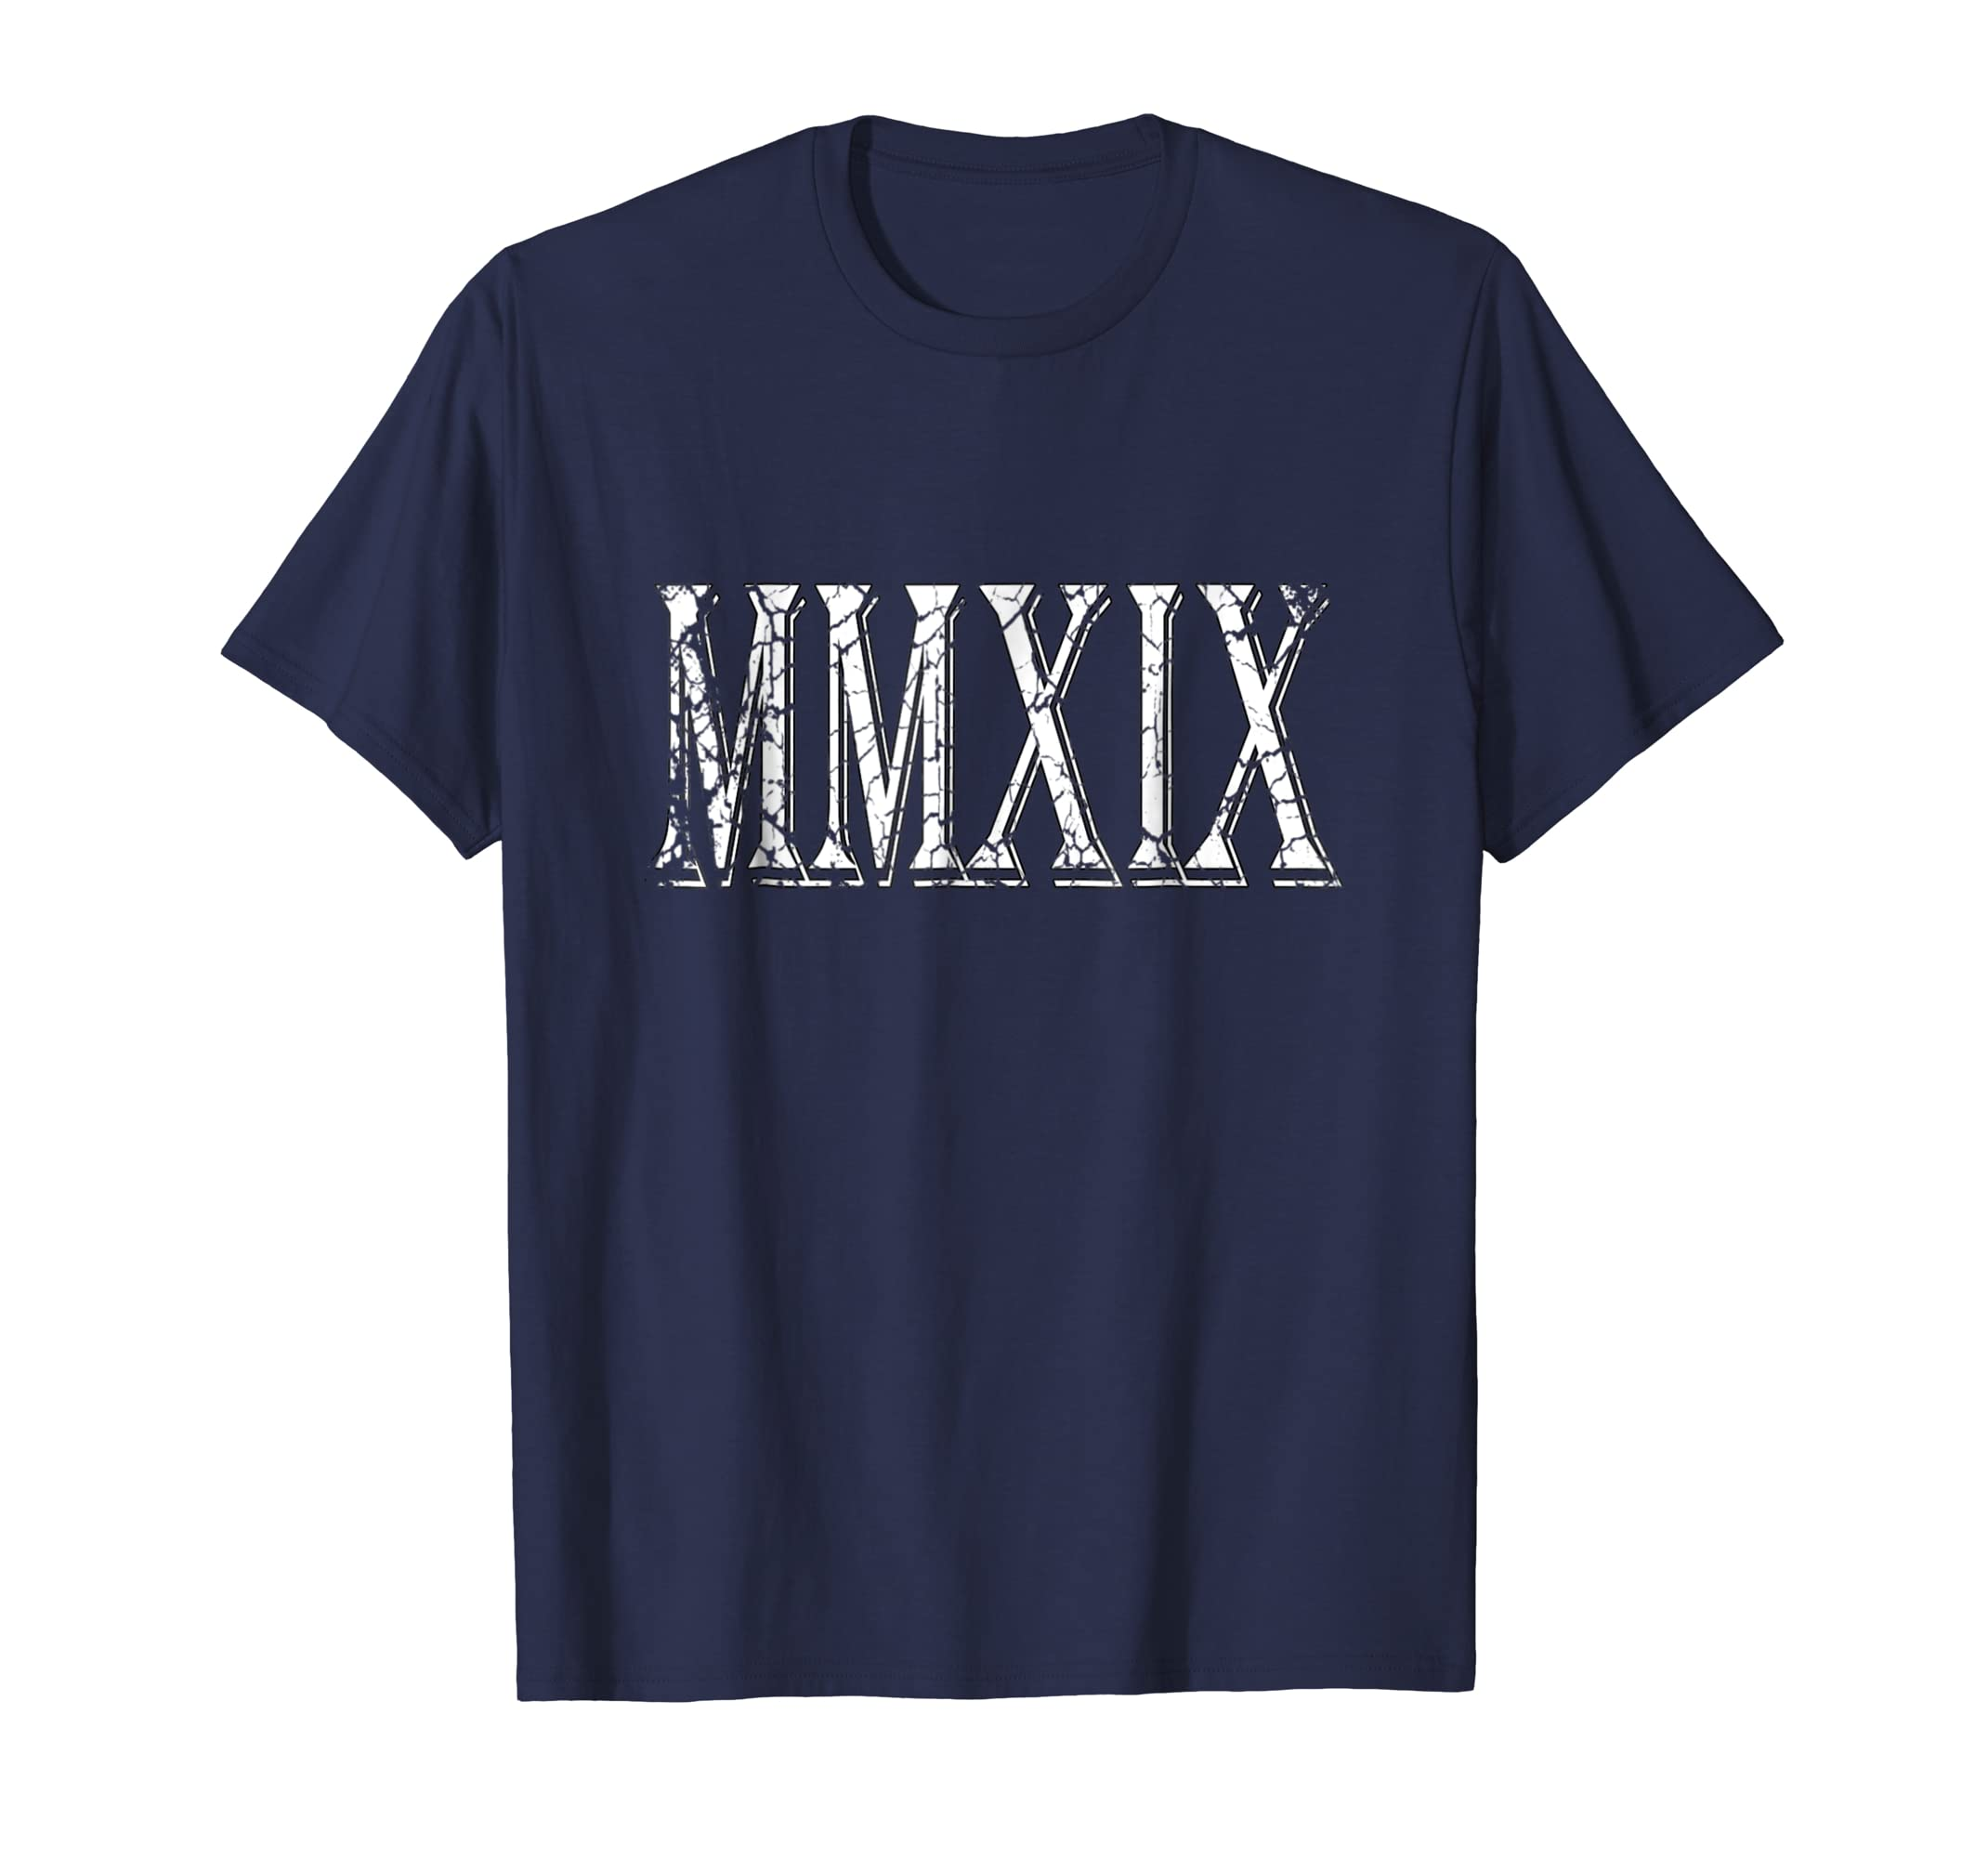 2019 MMXIX in Roman Numerals New Year TShirt-azvn